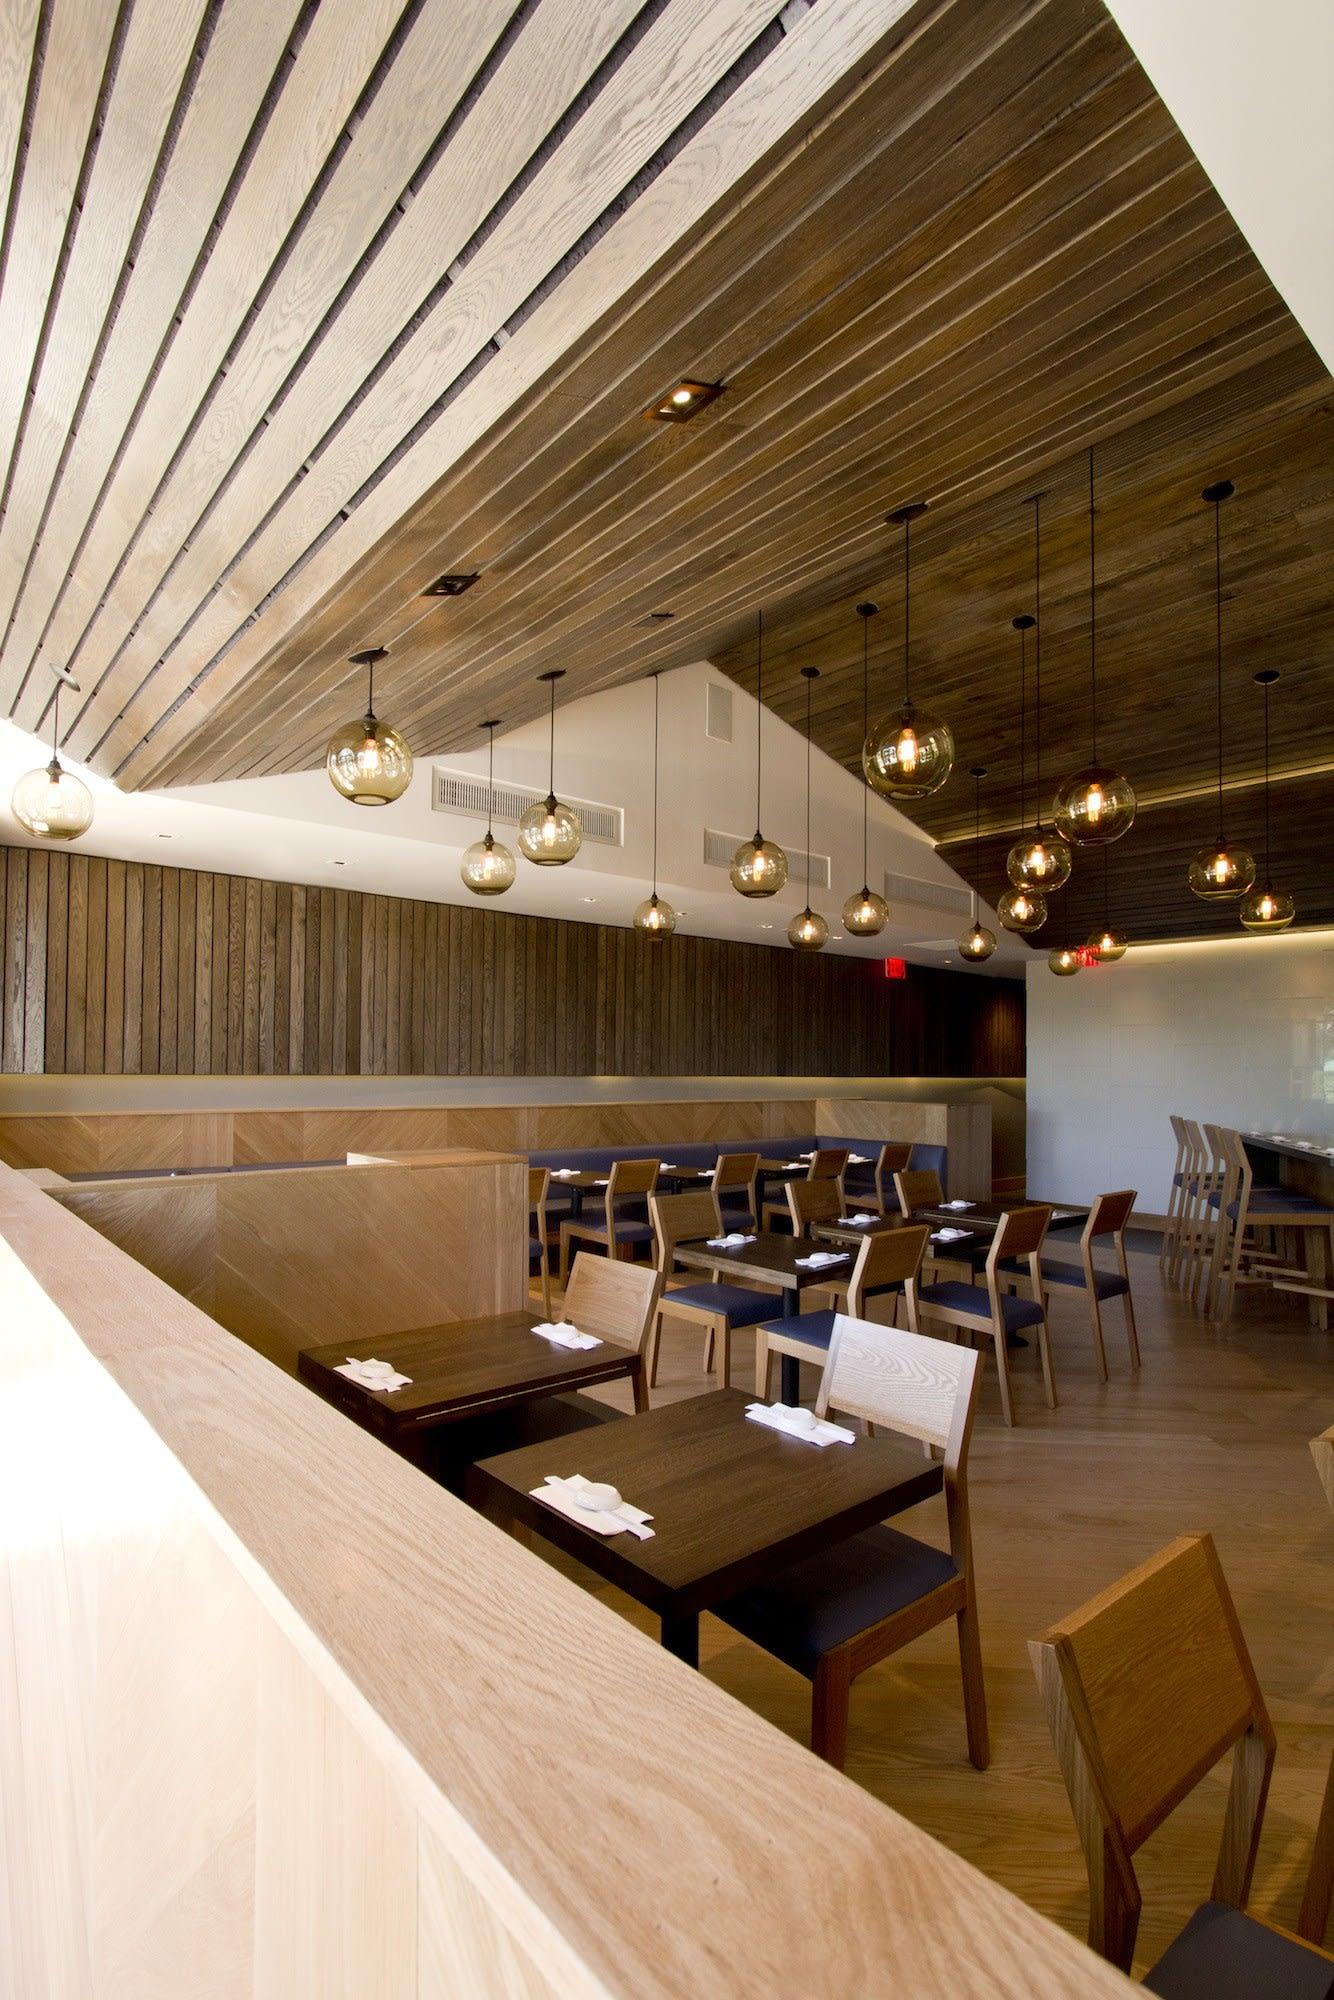 Interior Design by Studio DEX seen at SUGARFISH by sushi nozawa, Commons Way, Calabasas - Interior Design